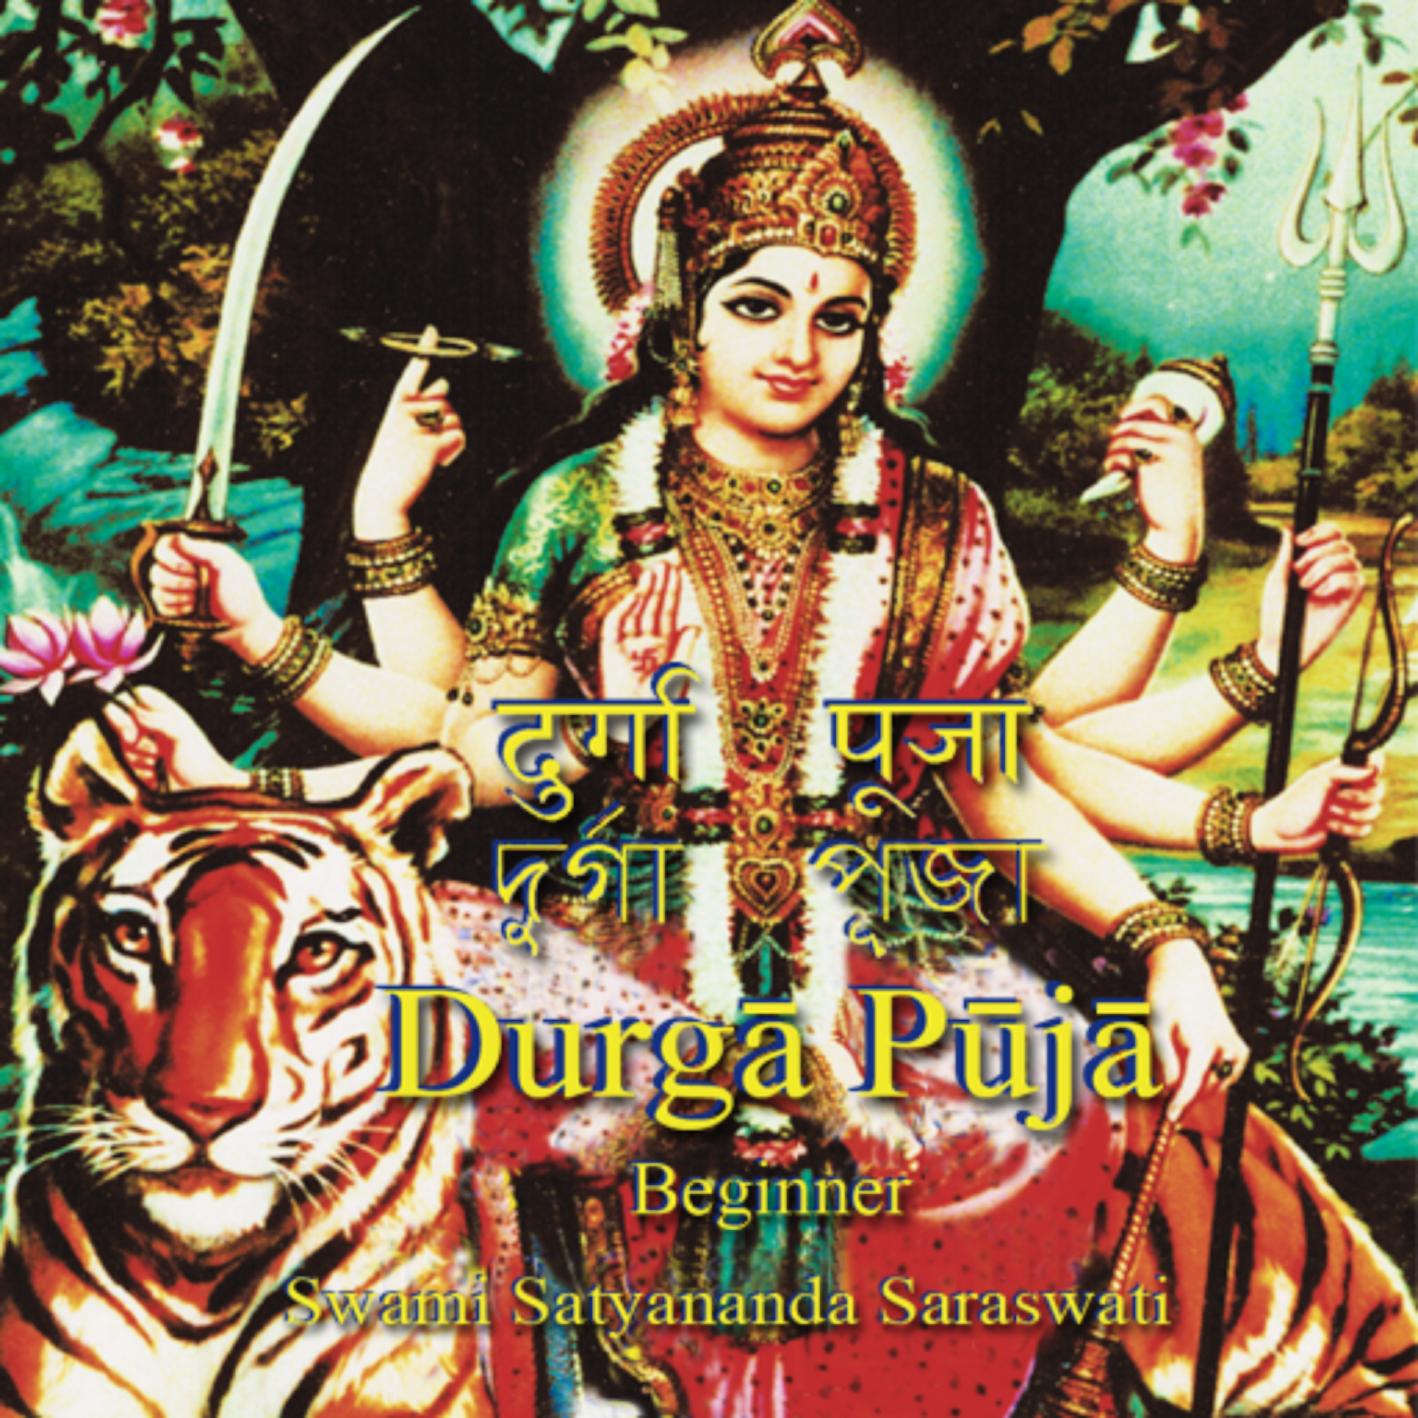 Beginner's Durga Puja